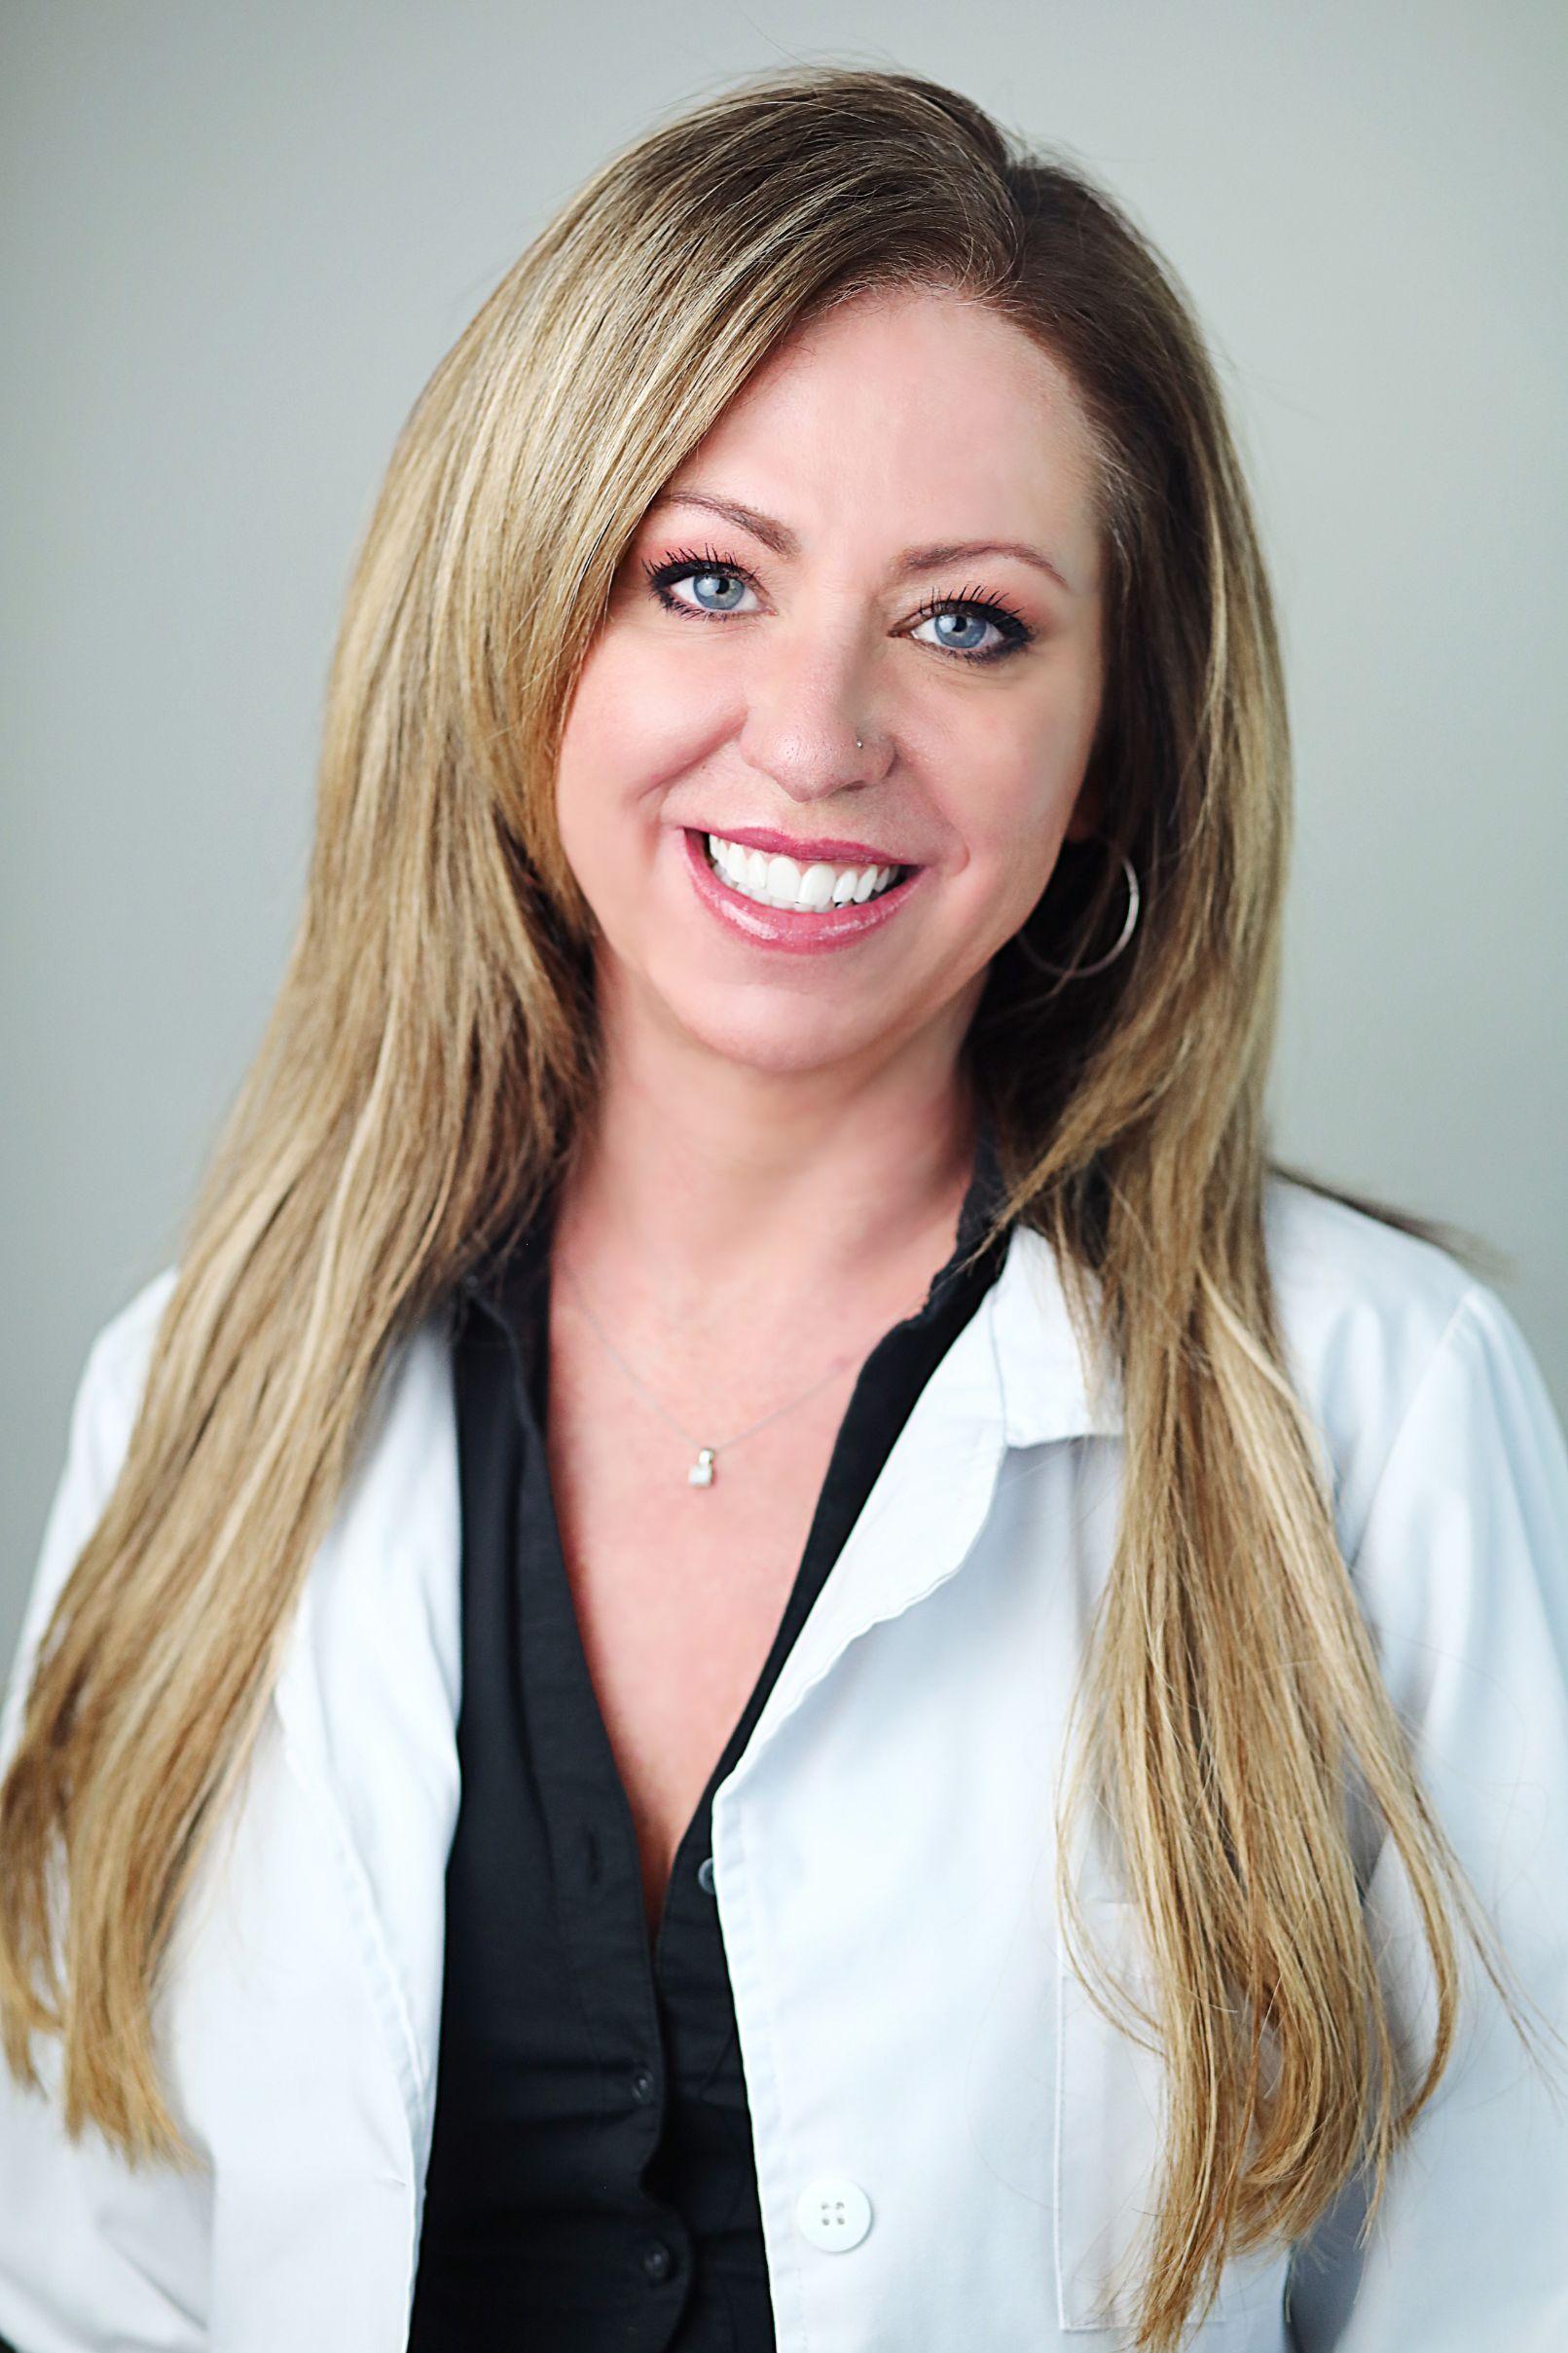 Shawna Yates, RN, BSN